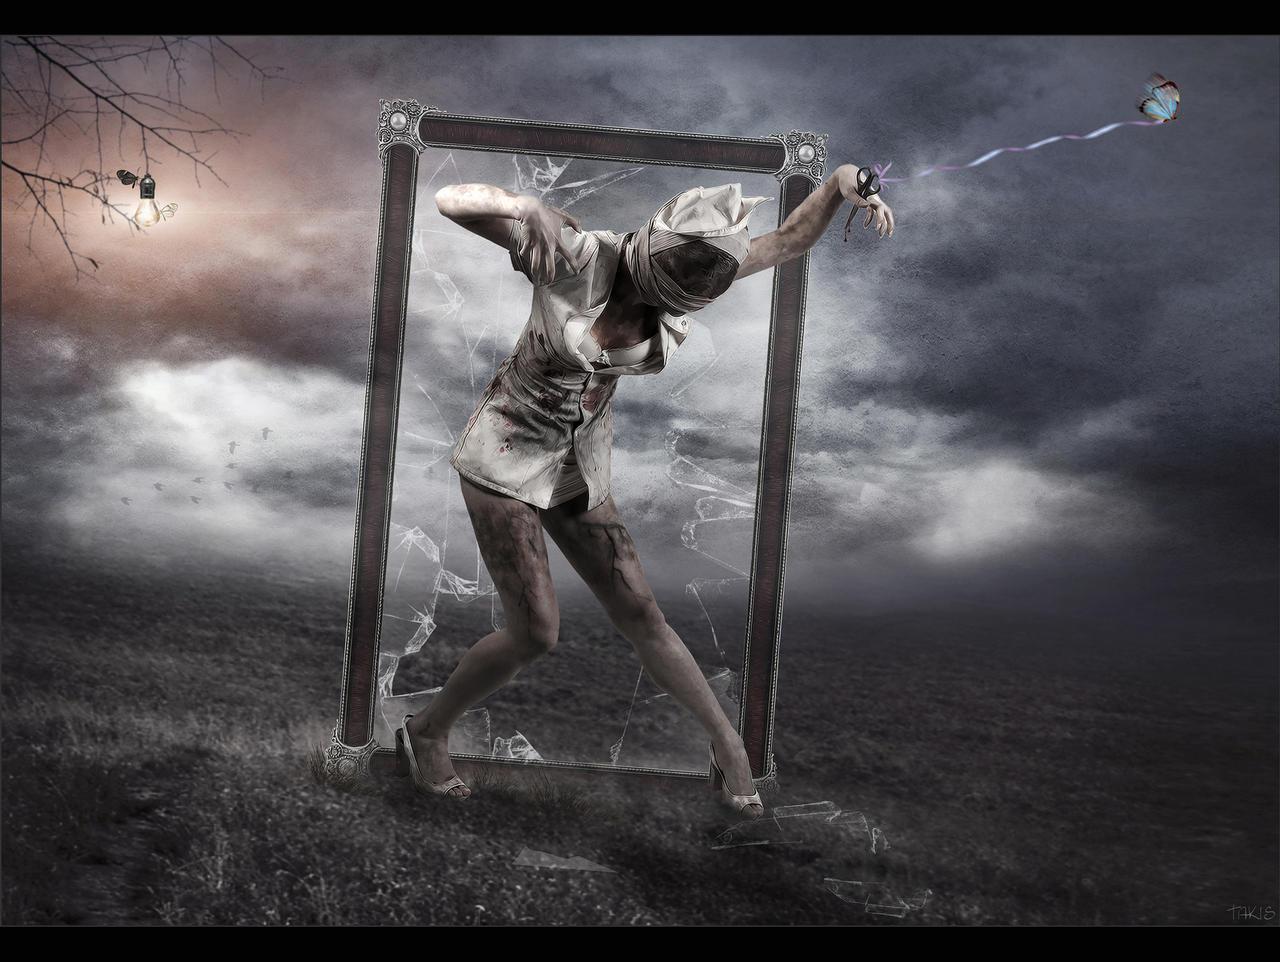 Surreal Reality By Tasa78 On Deviantart